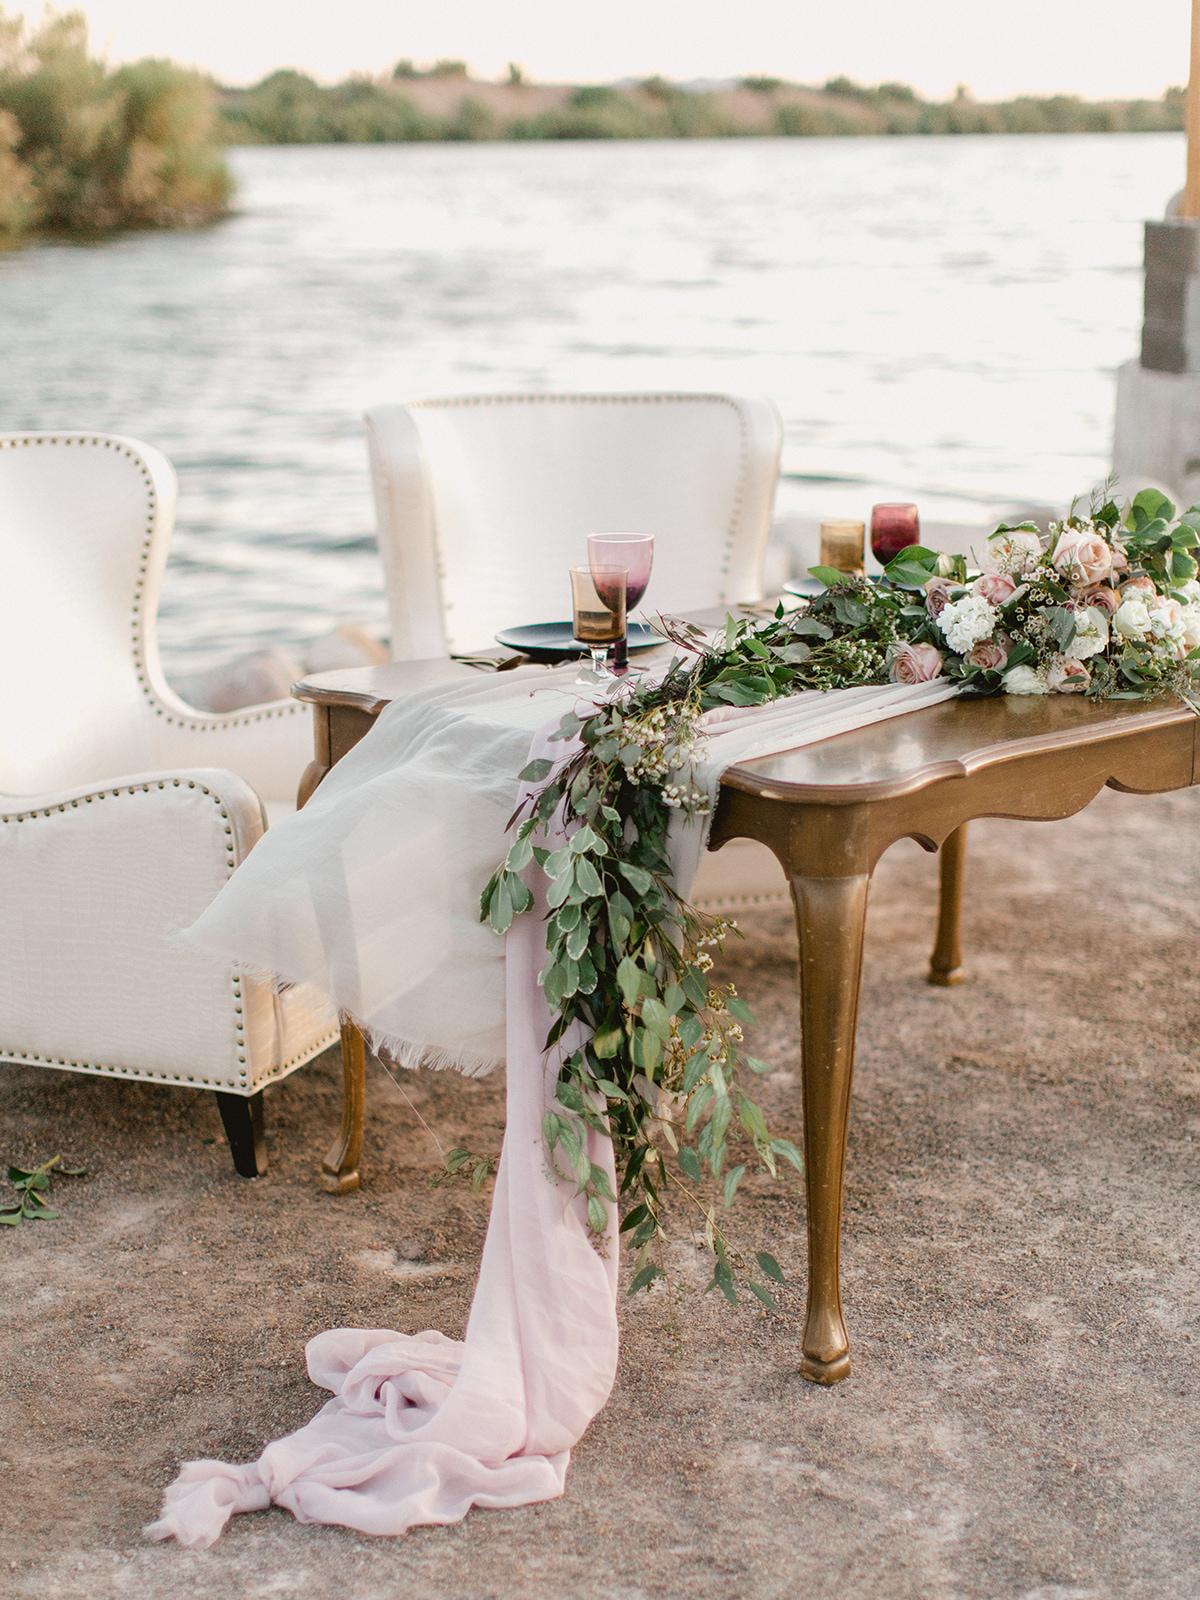 Romantic Wedding Sweetheart Table on Beach